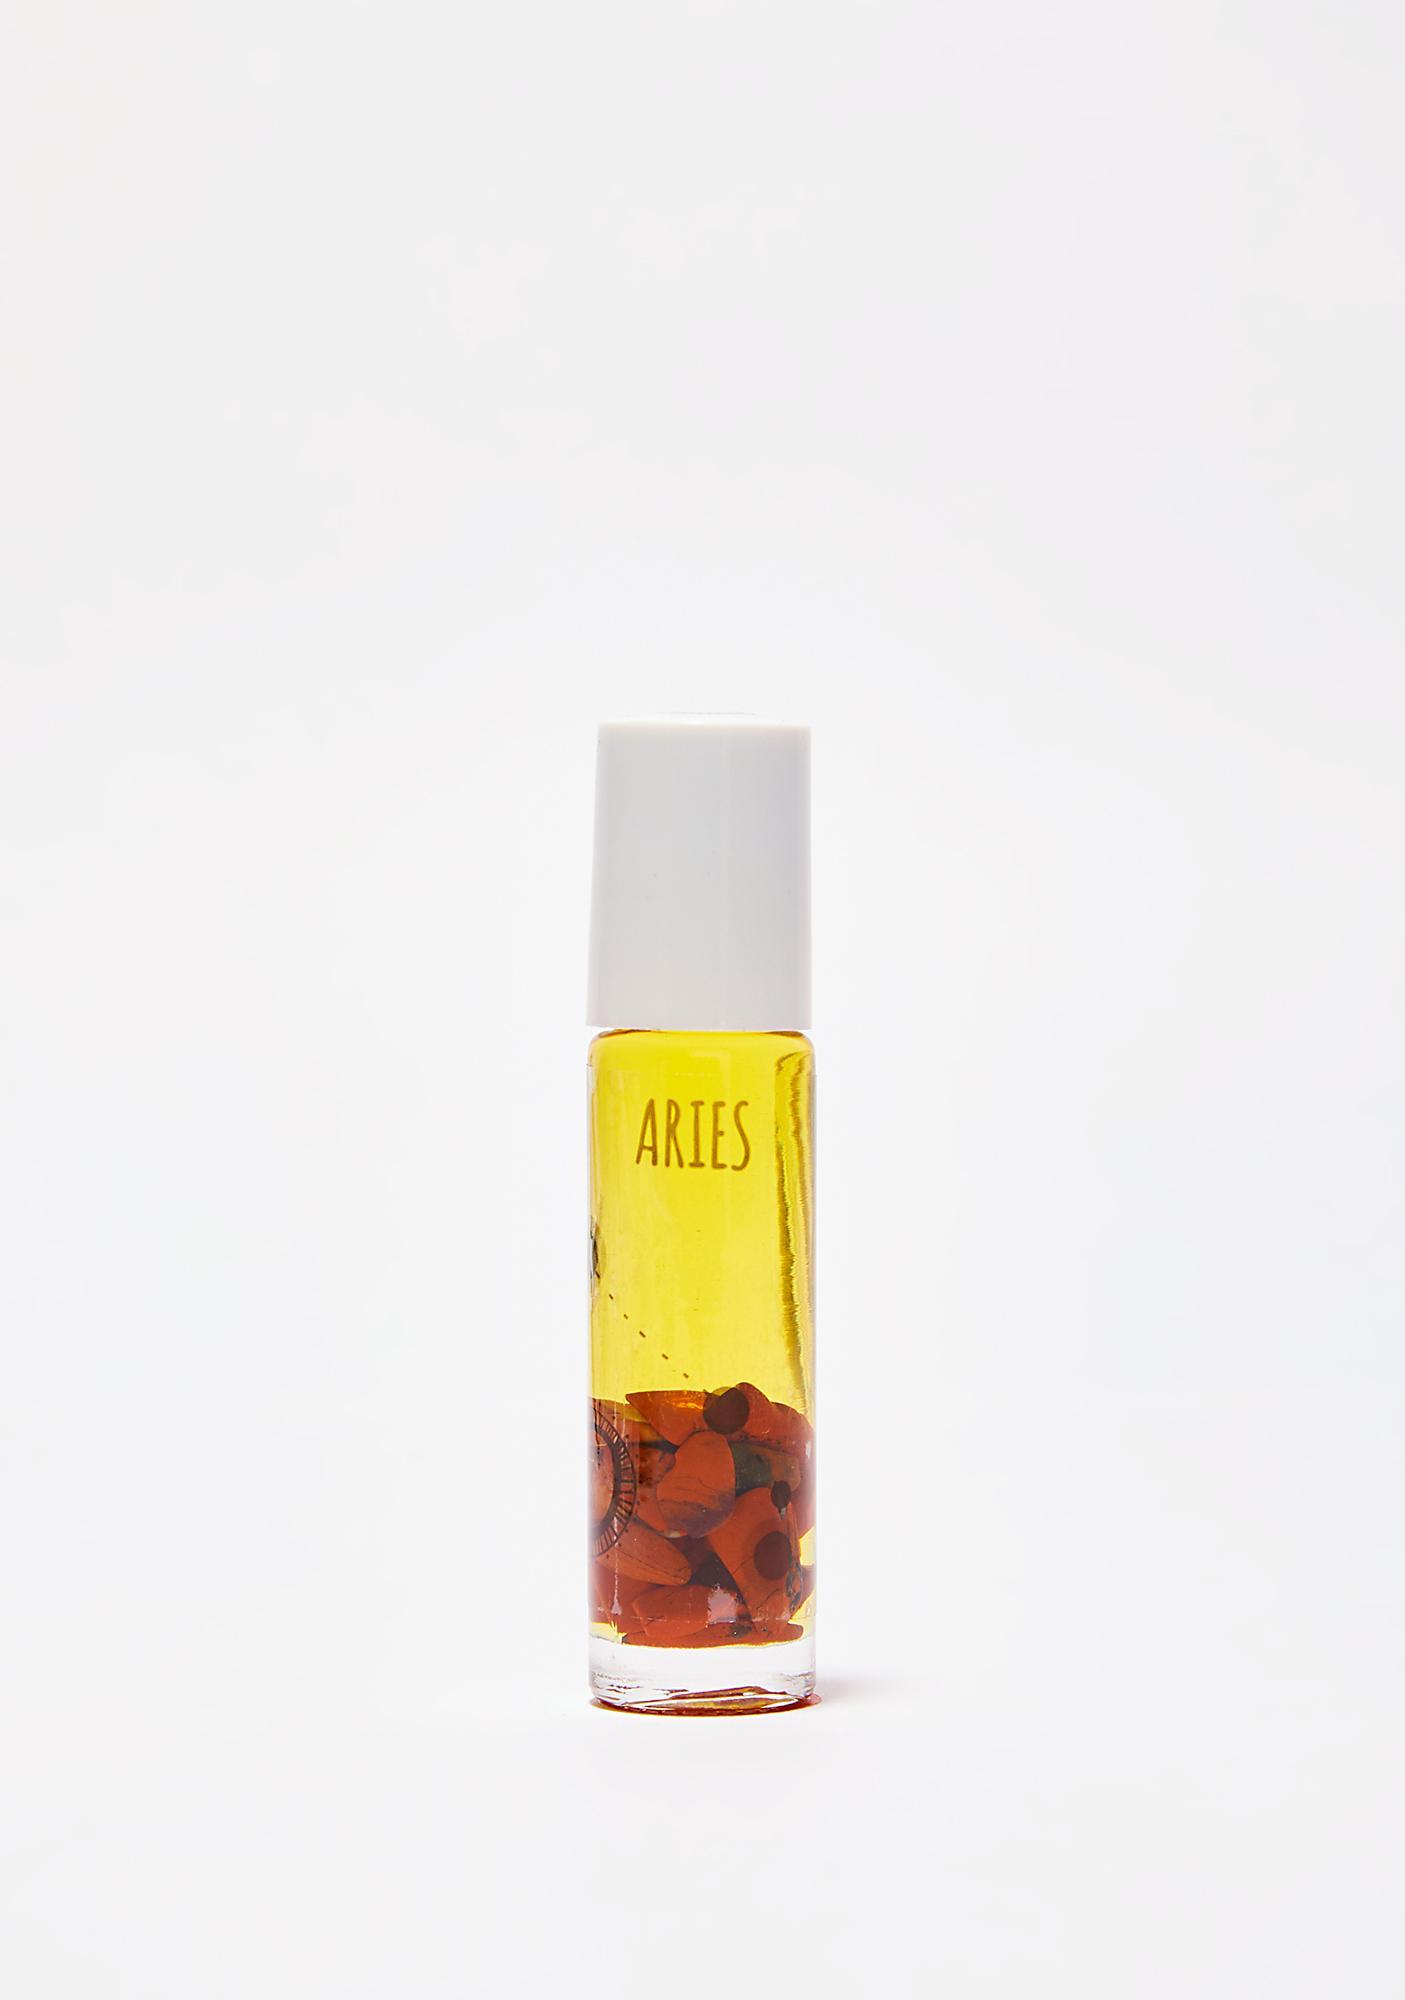 Little Shop of Oils Aries Oil Perfume Roller